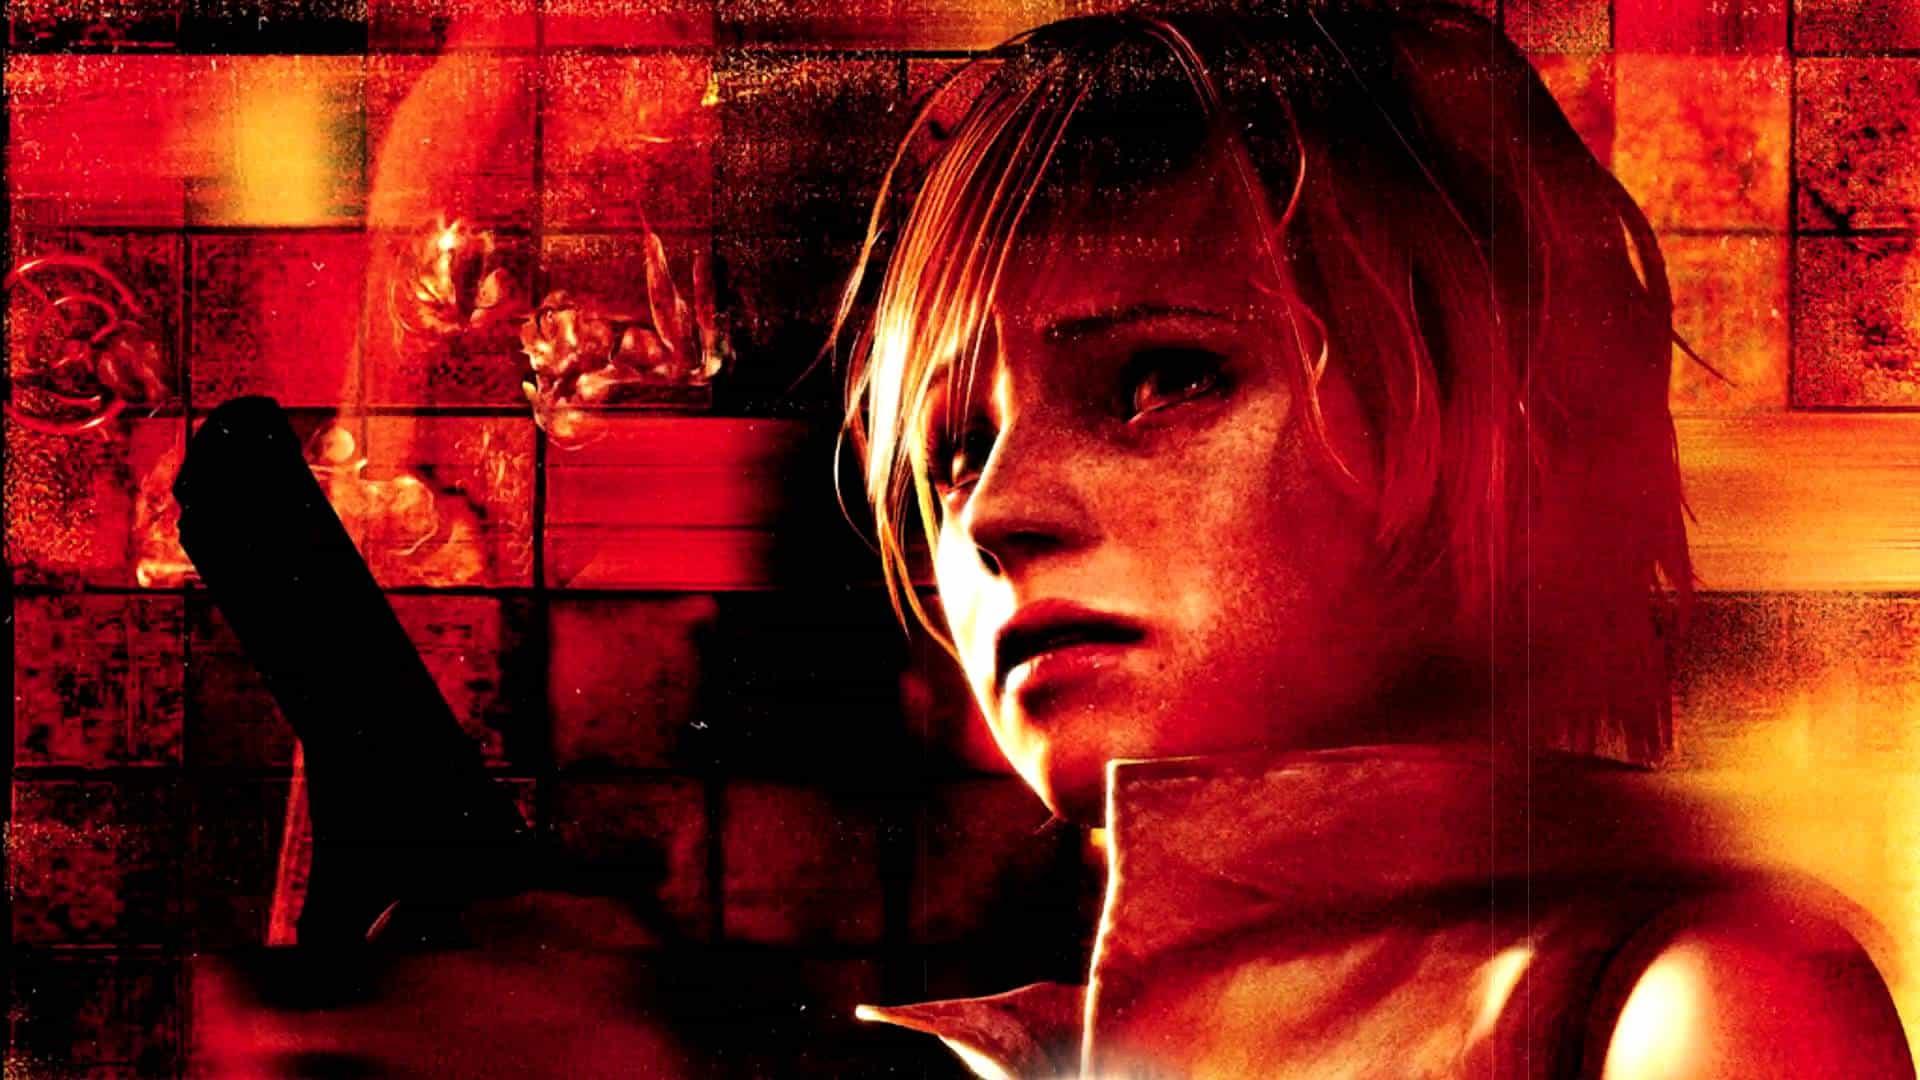 Silent Hill main